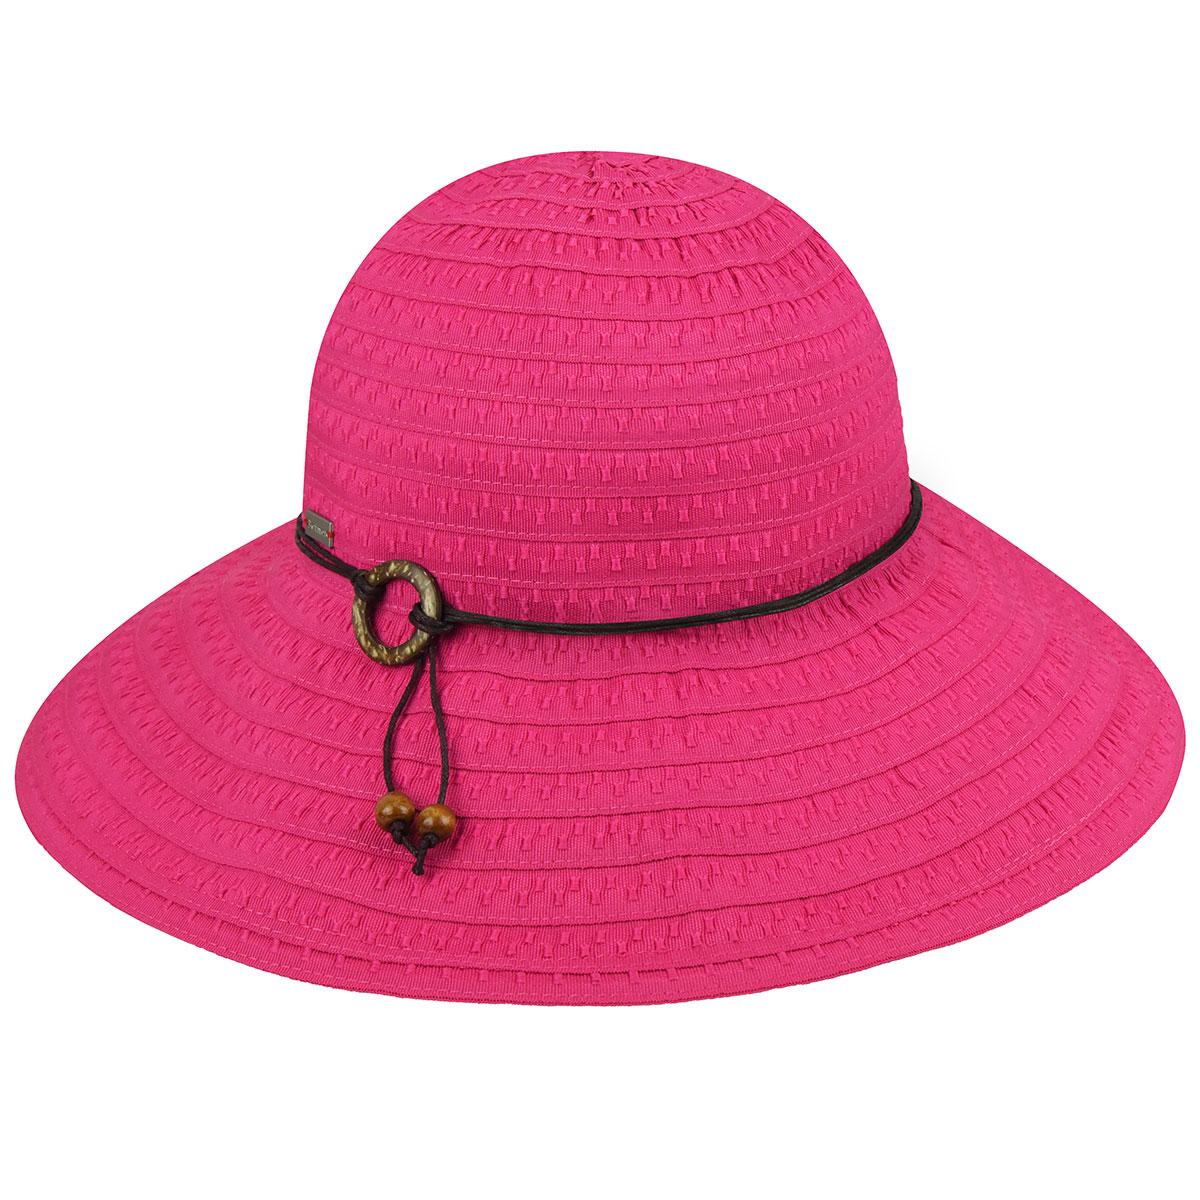 Betmar Coconut Ring Safari Hat in Fuchsia